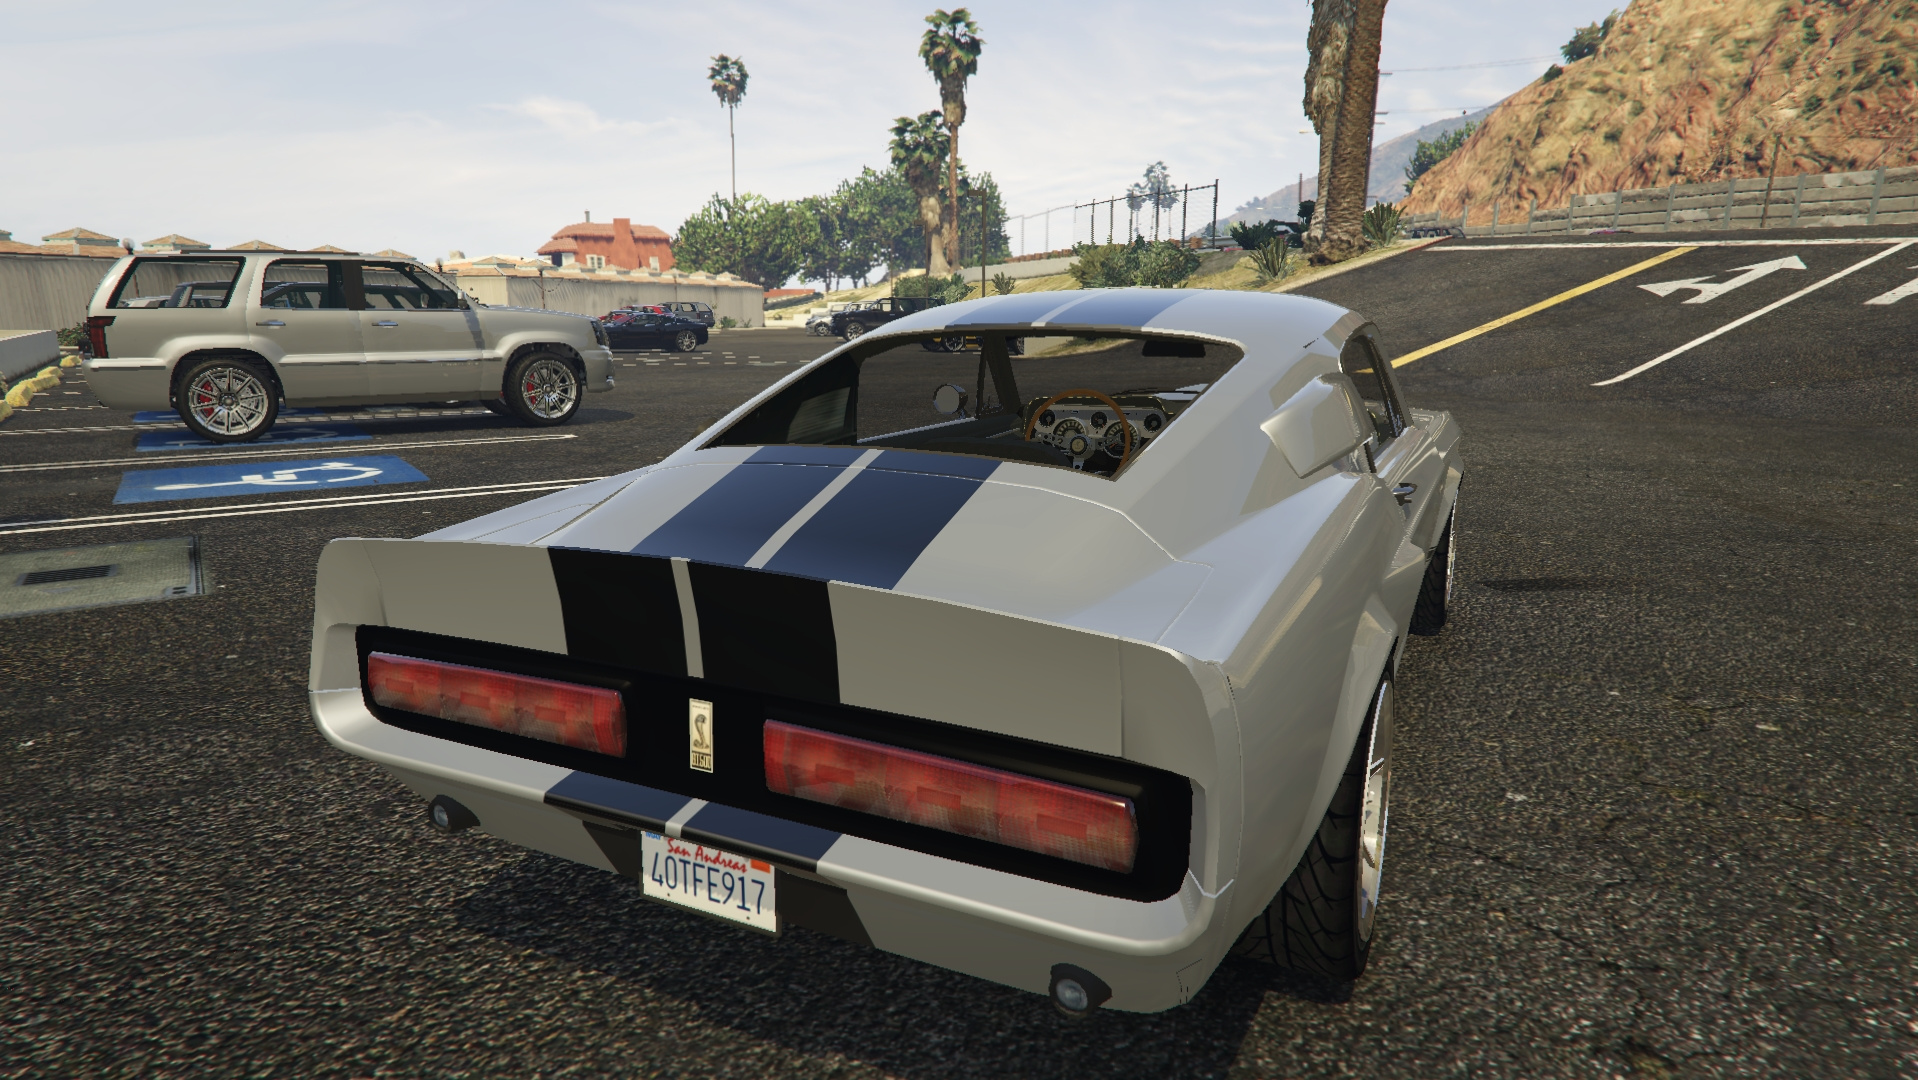 1967 Shelby Mustang GT500 Eleanor GTA5 Mods